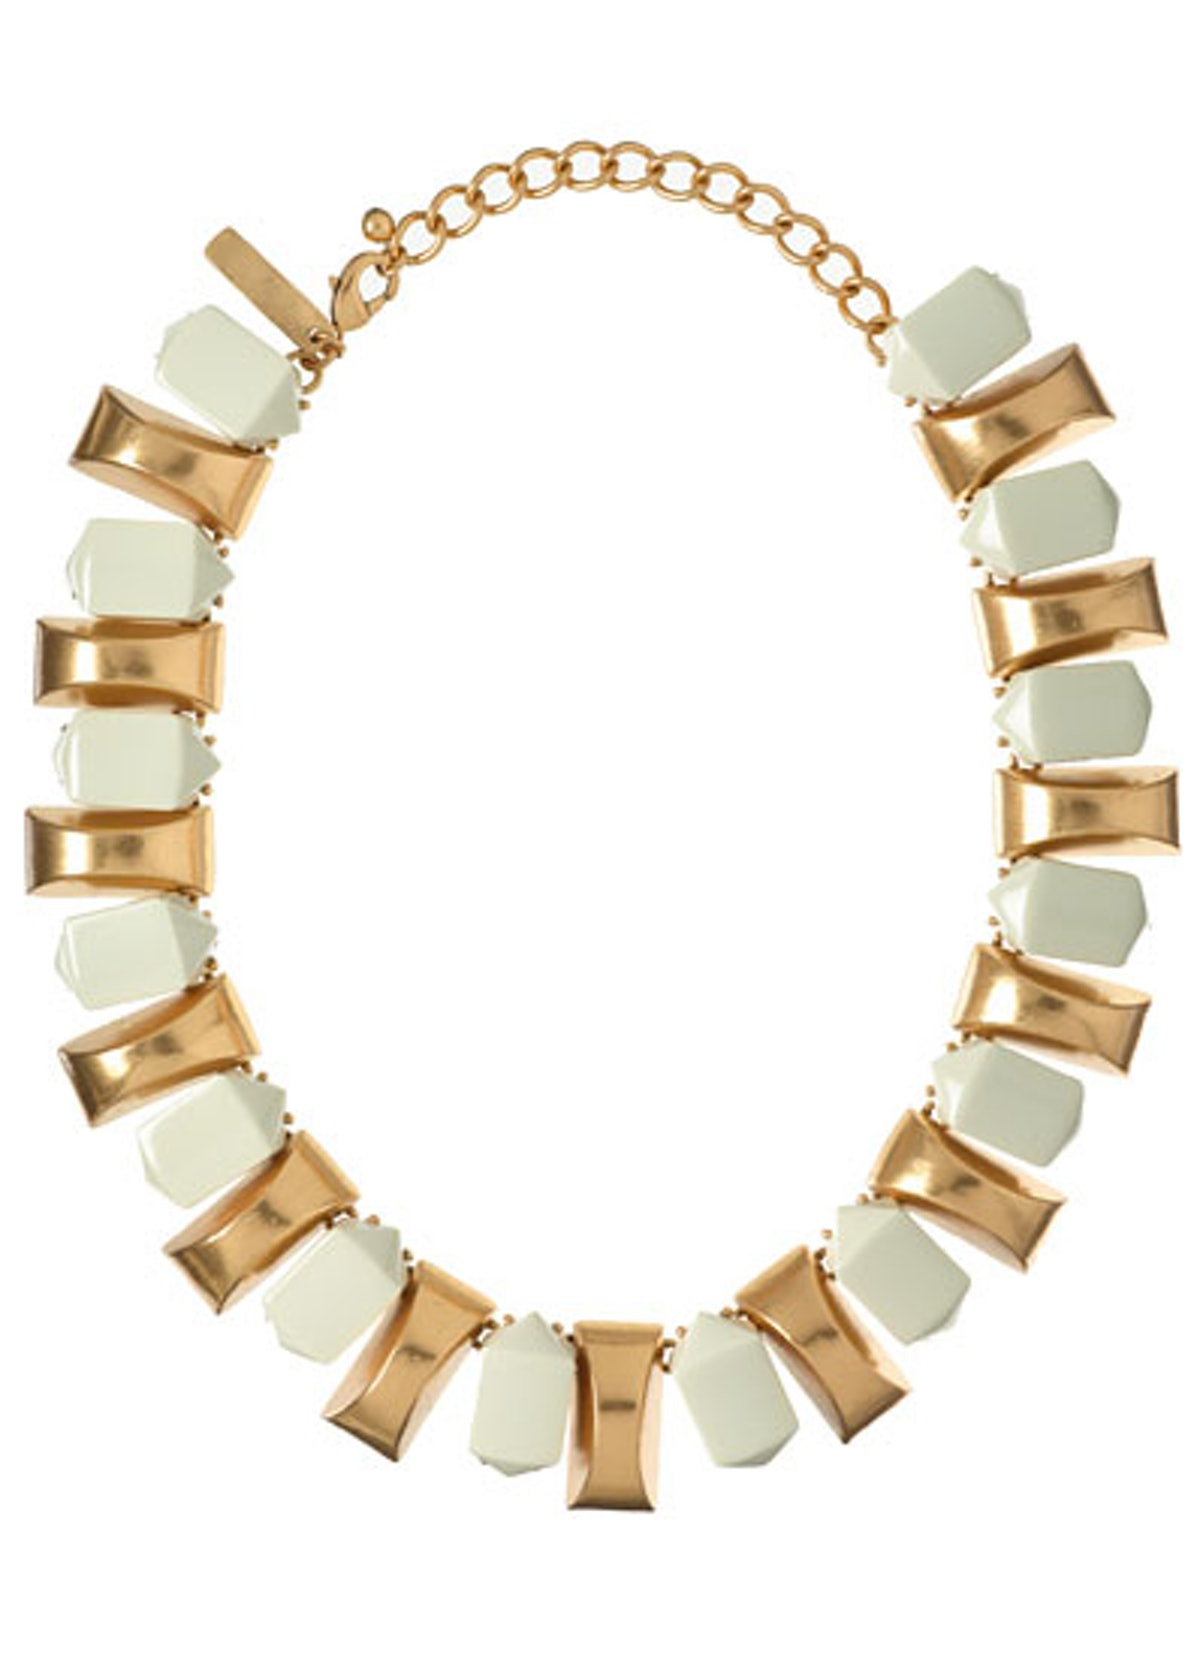 acss-gold-jewelry-03-v.jpg